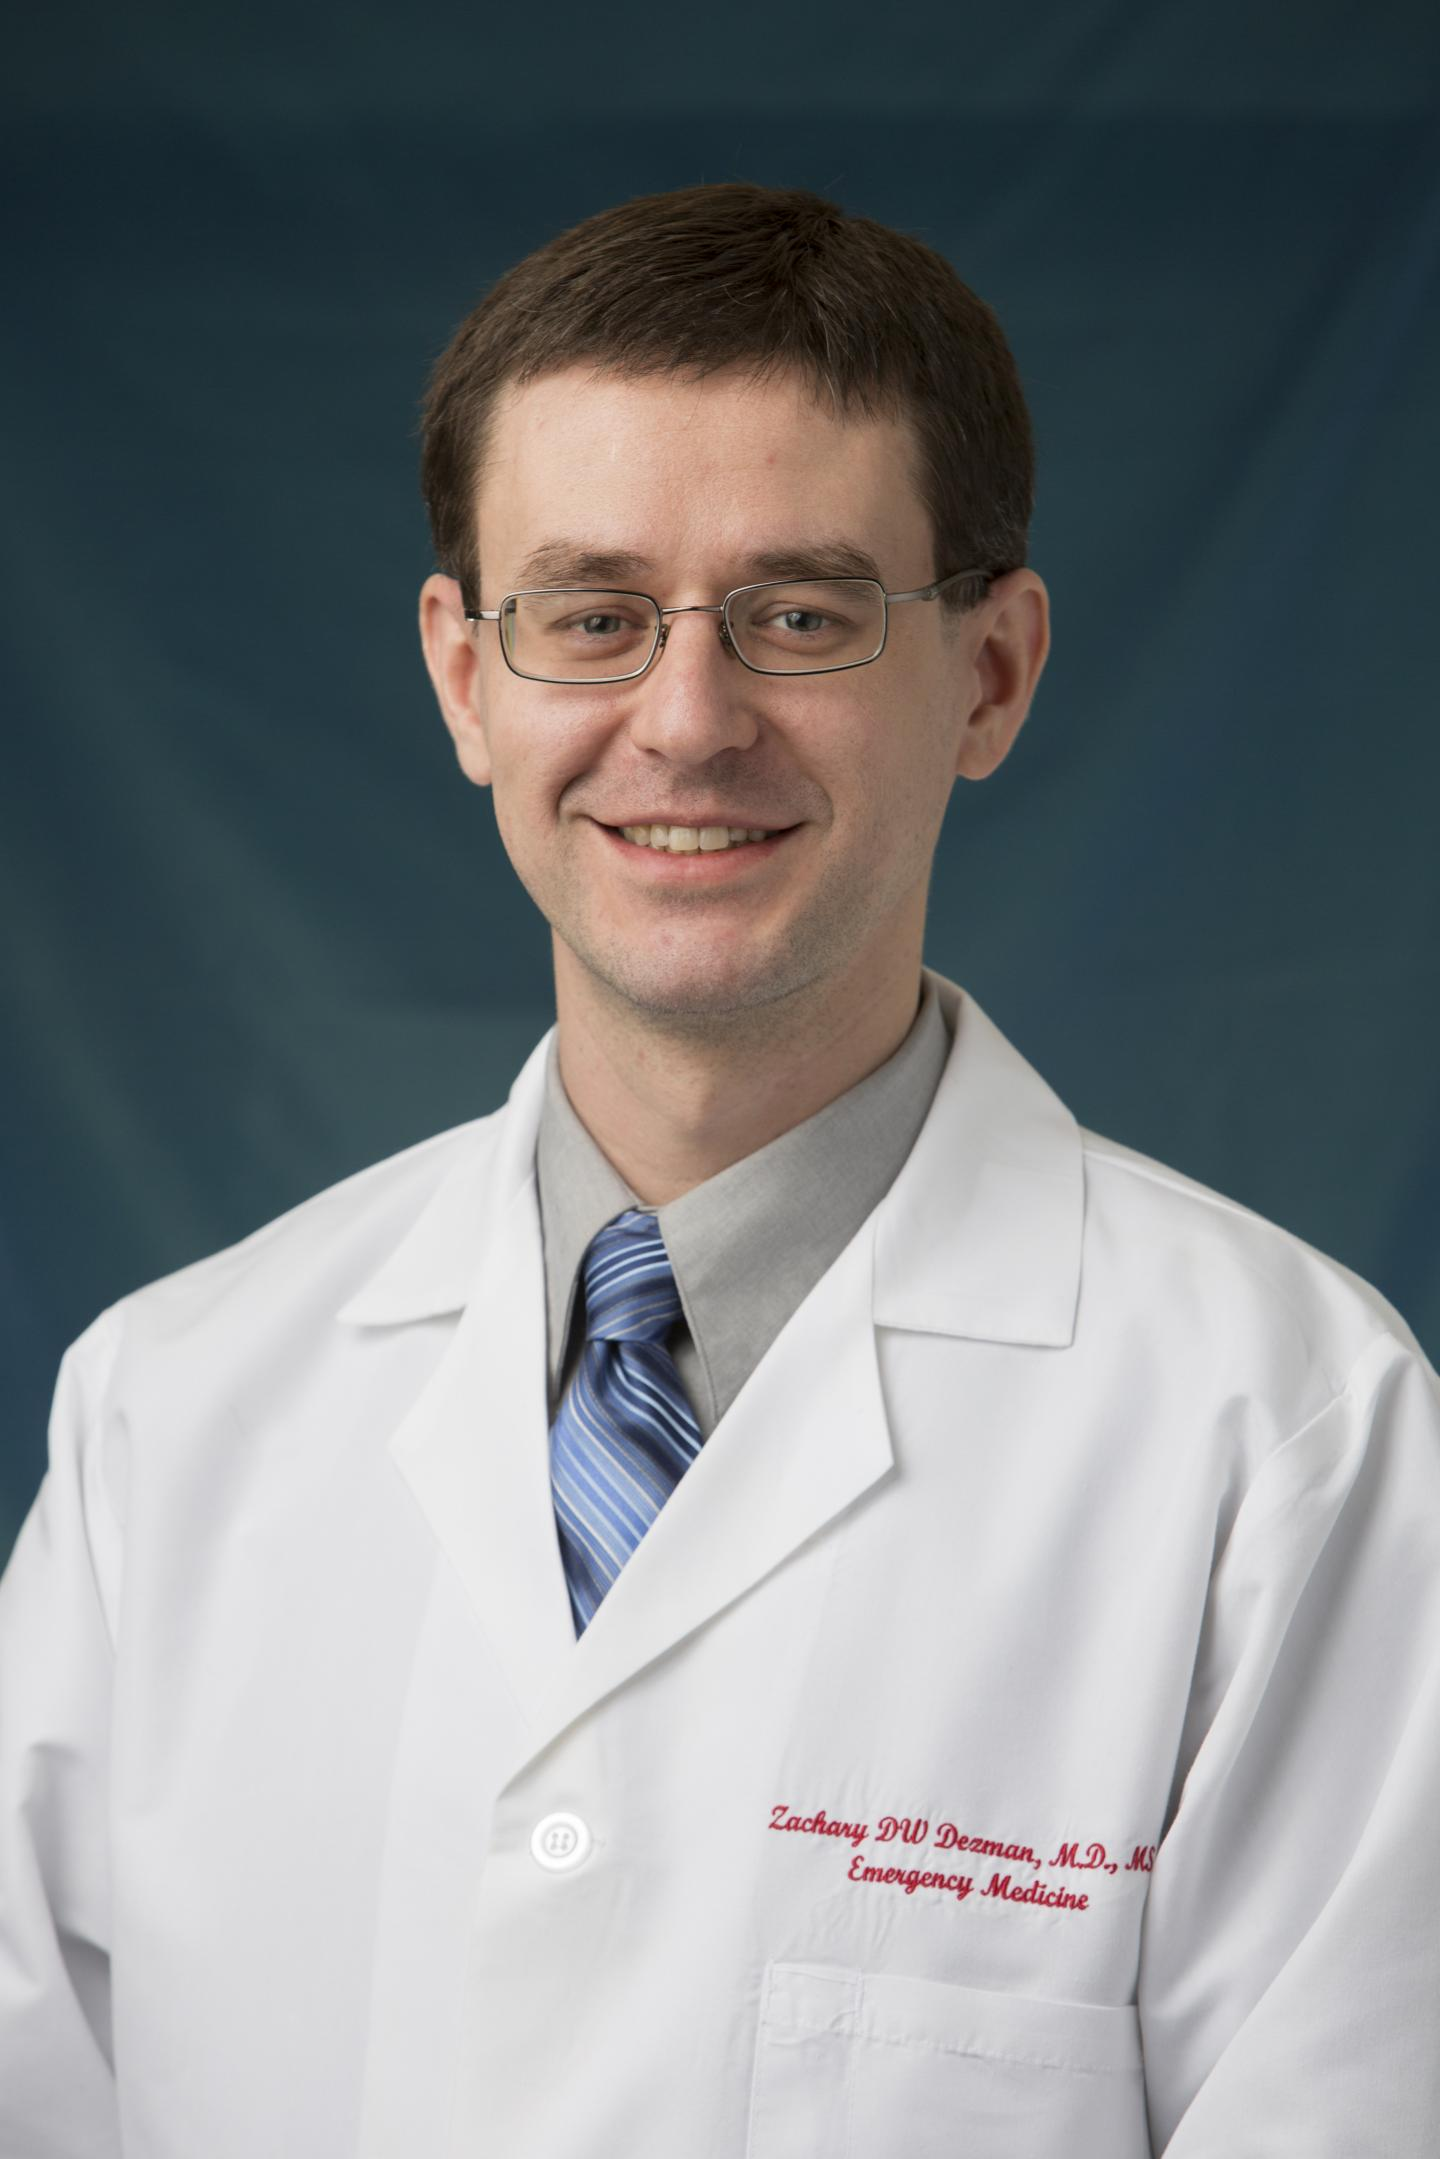 Zachary D.W. Dezman, MD, University of Maryland Medical Center